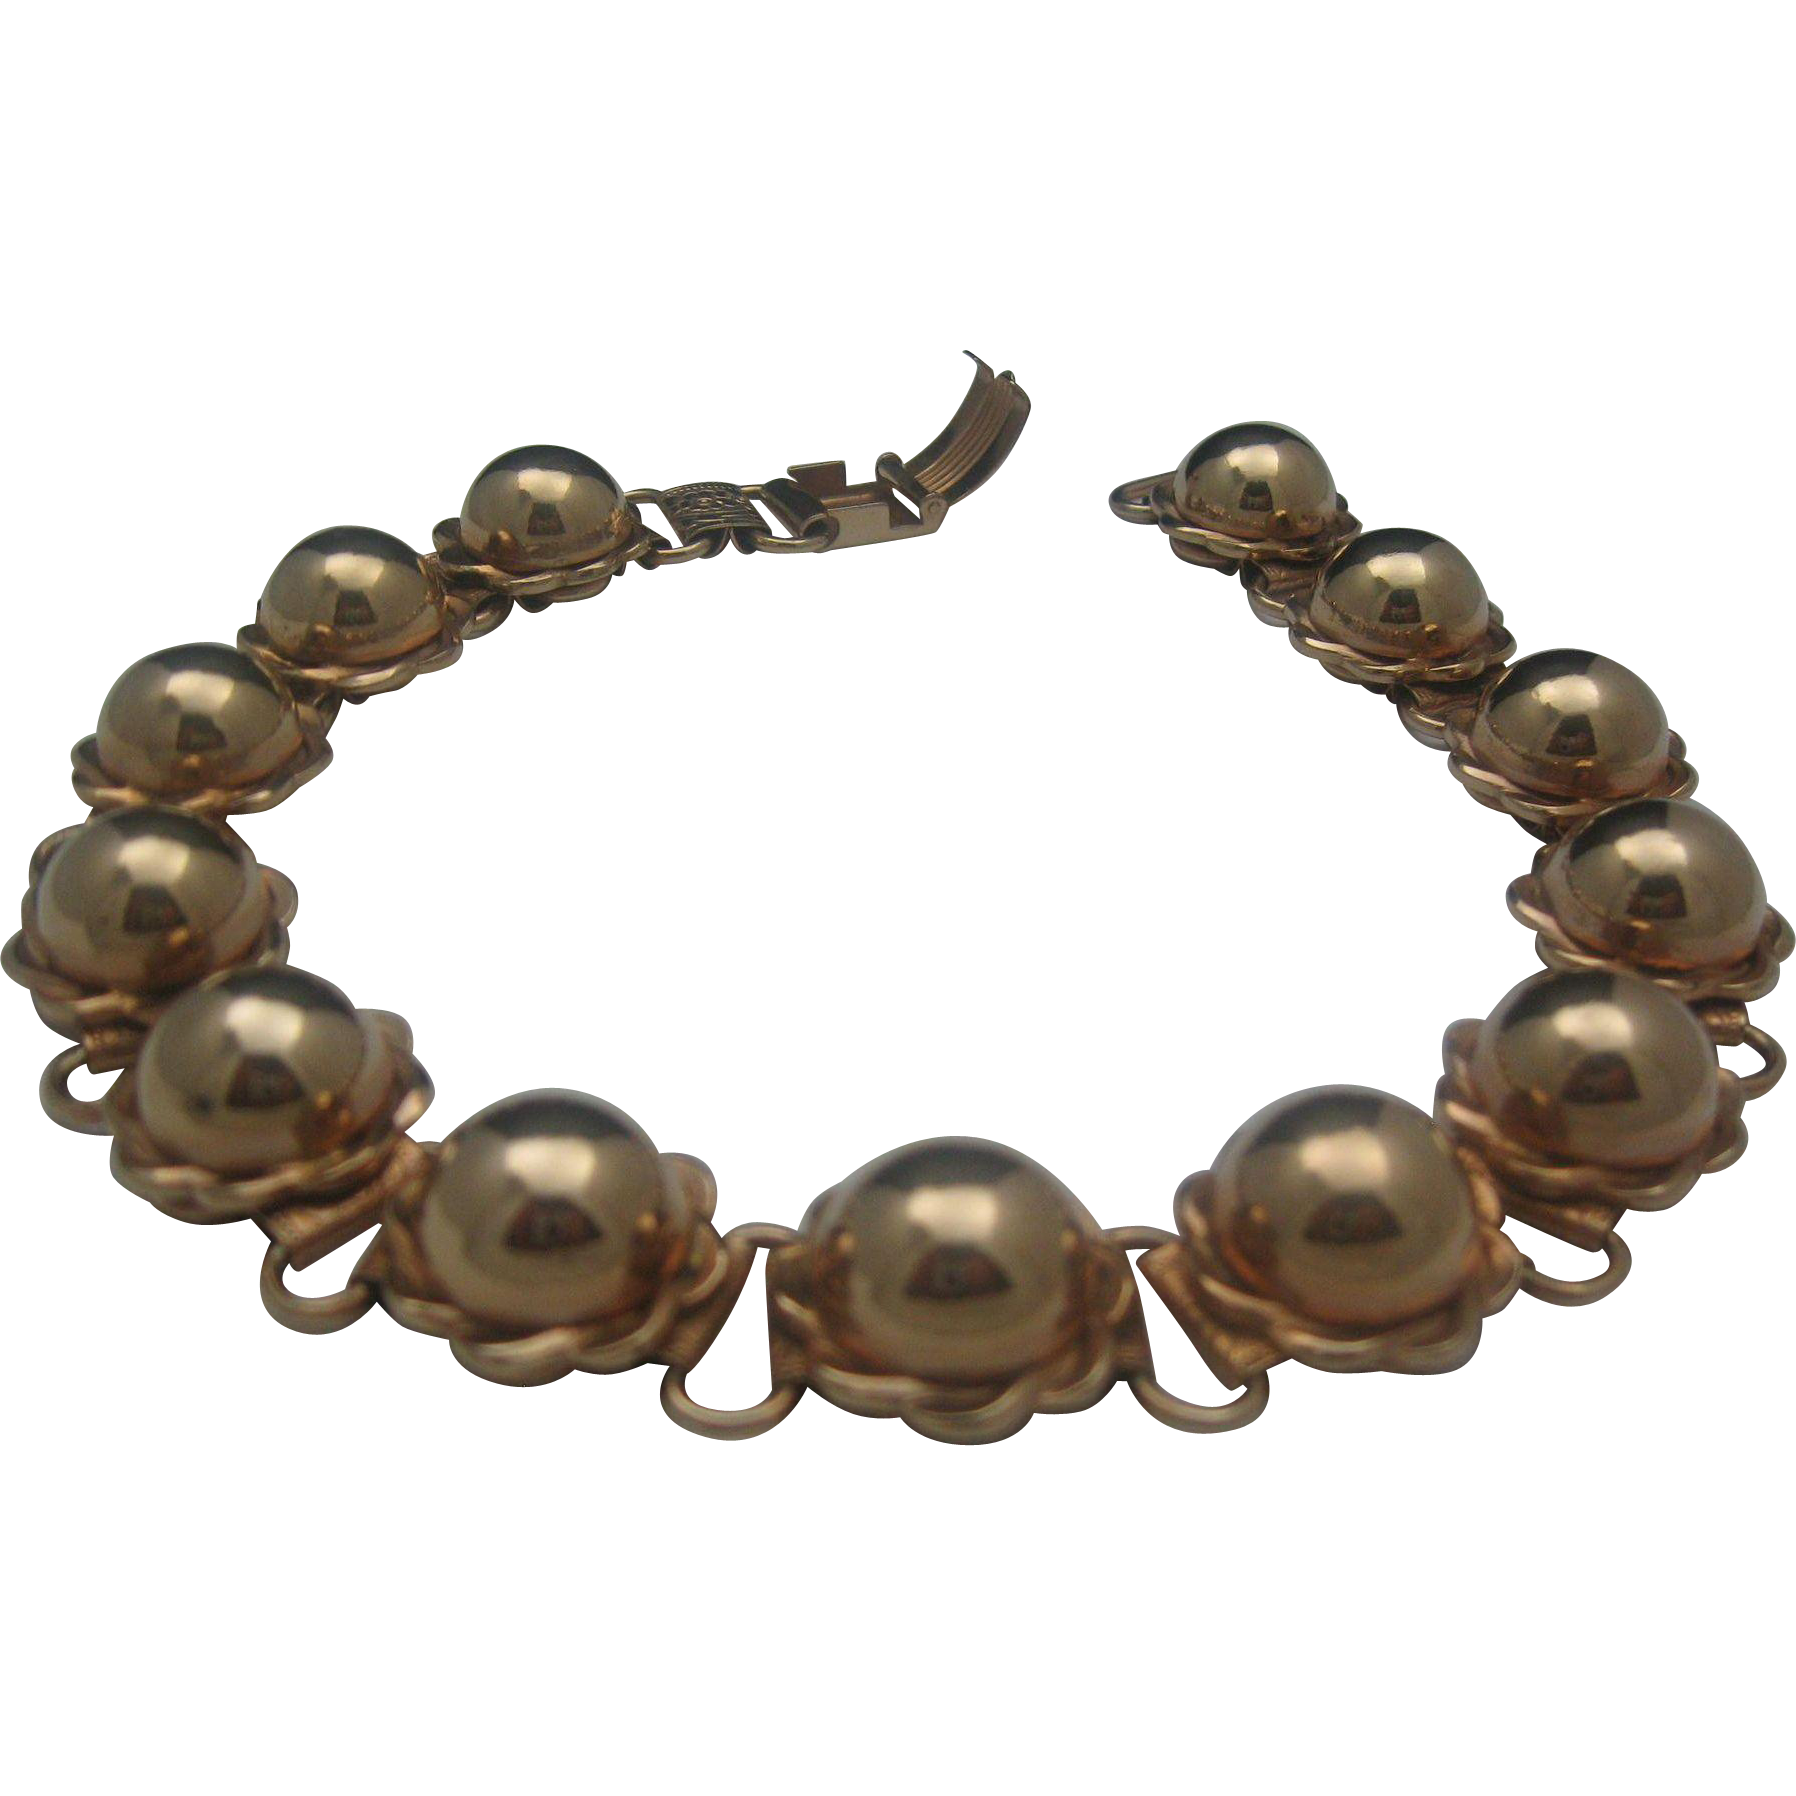 Victoria Revival Dog Collar Choker necklace